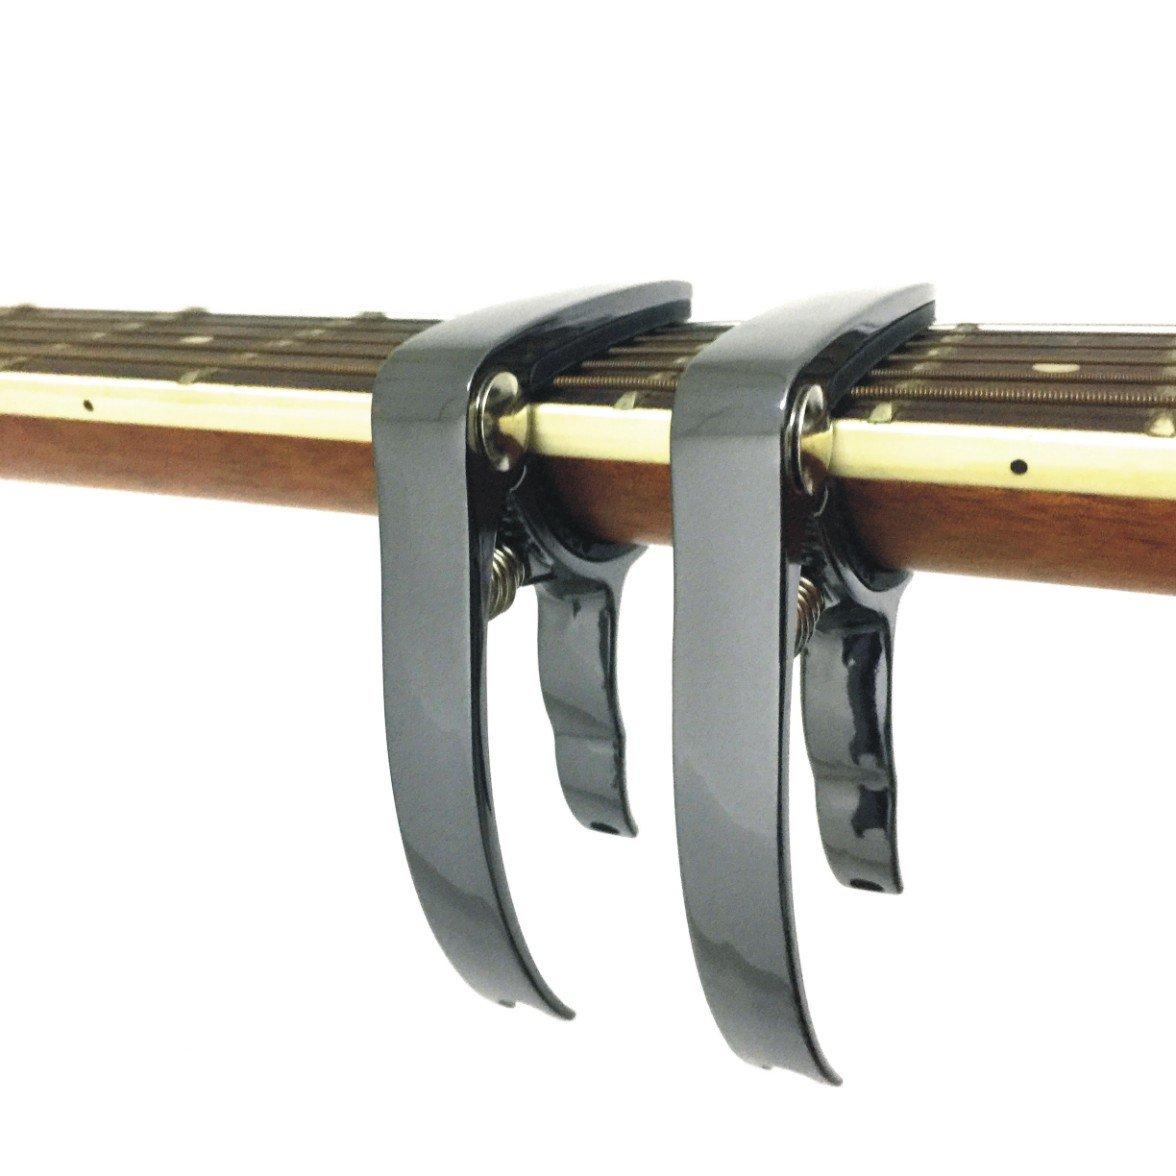 Happyard Guitar Capo String Pin Puller(2PCS Bright Black)